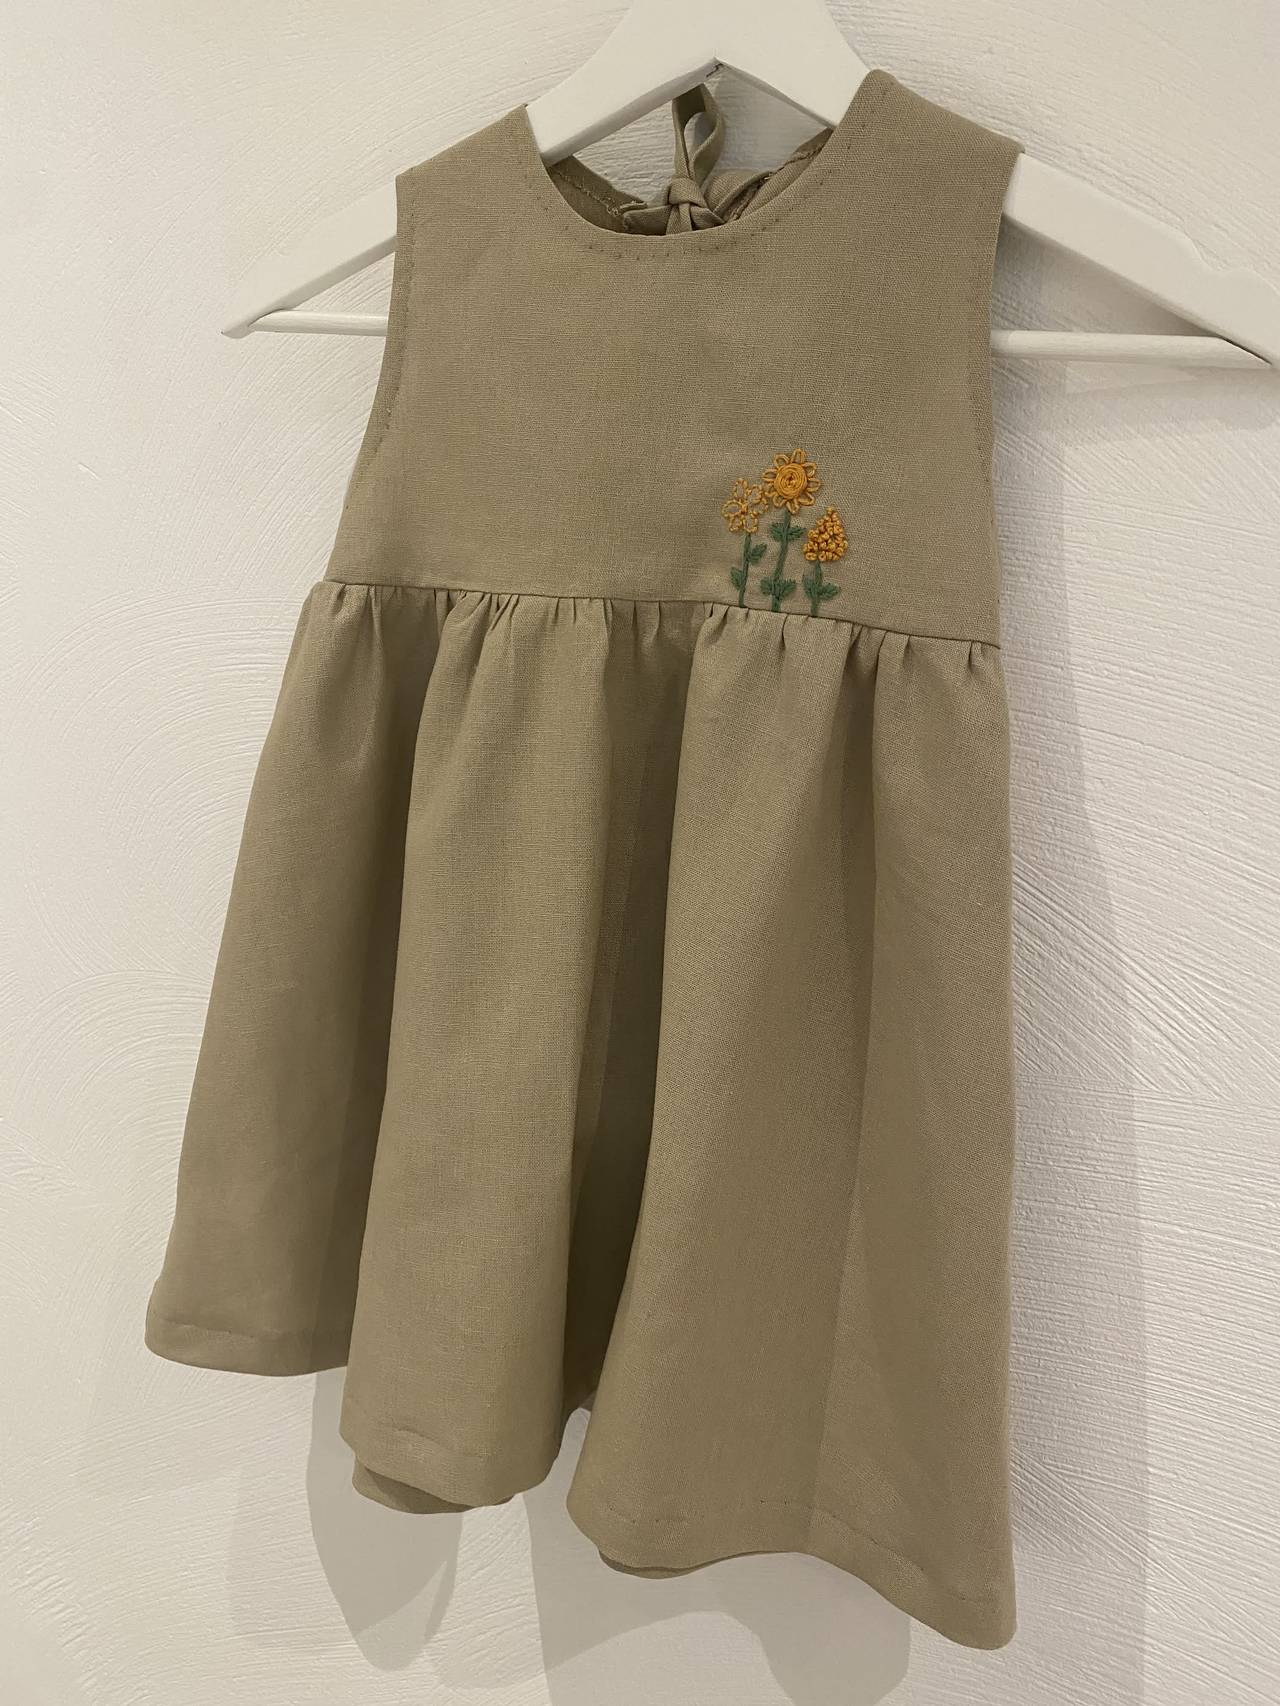 Karoline har sydd denne flotte barnekjolen.